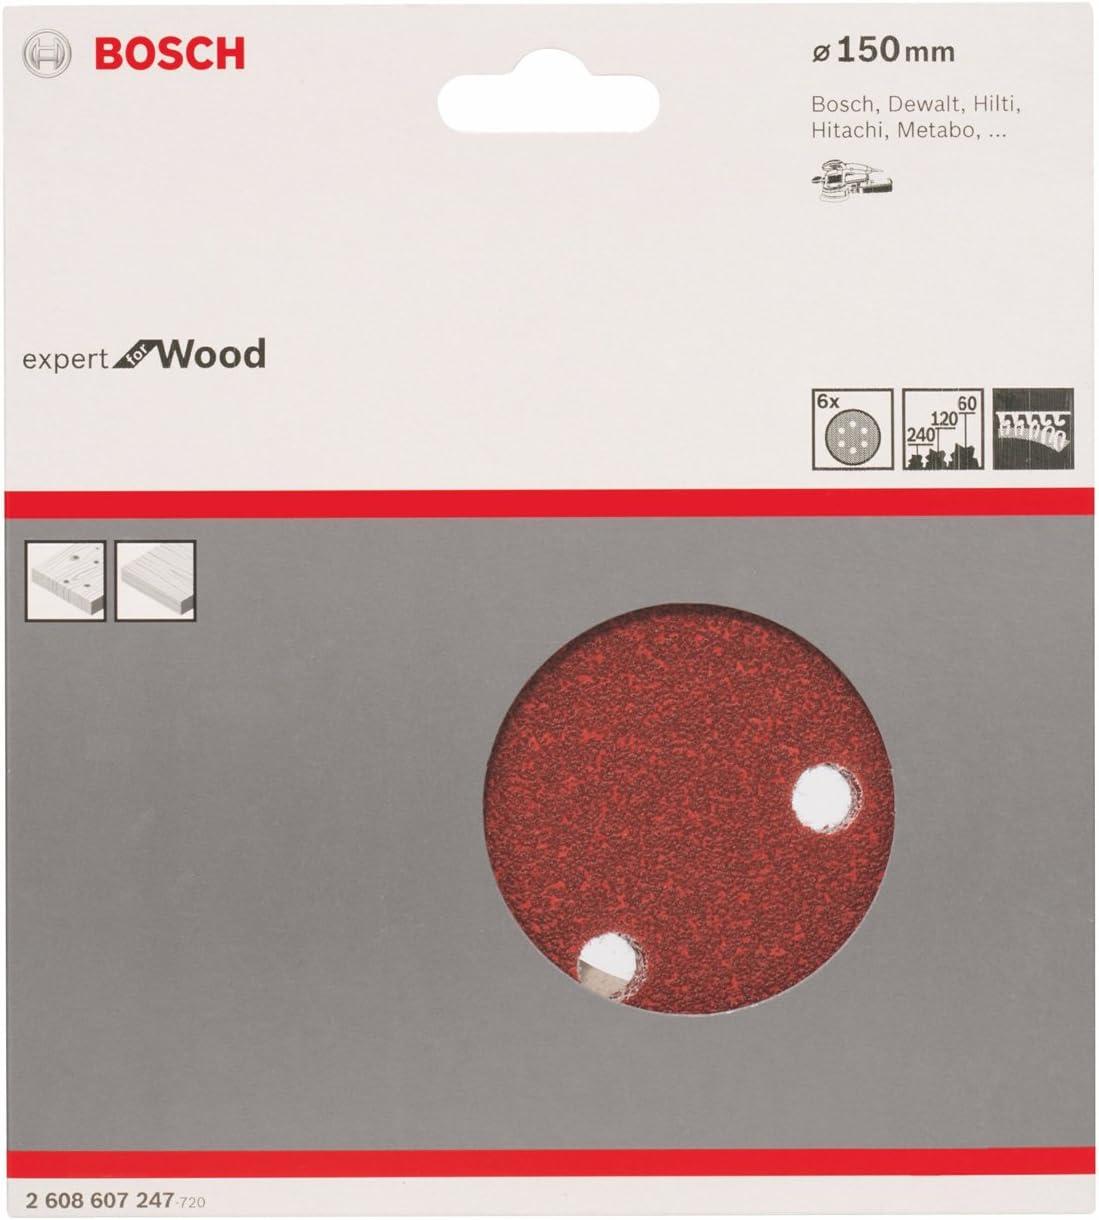 Bosch Professional Schleifblatt C430  Expert for Wood+Paint 150mm Set 6 Stk.